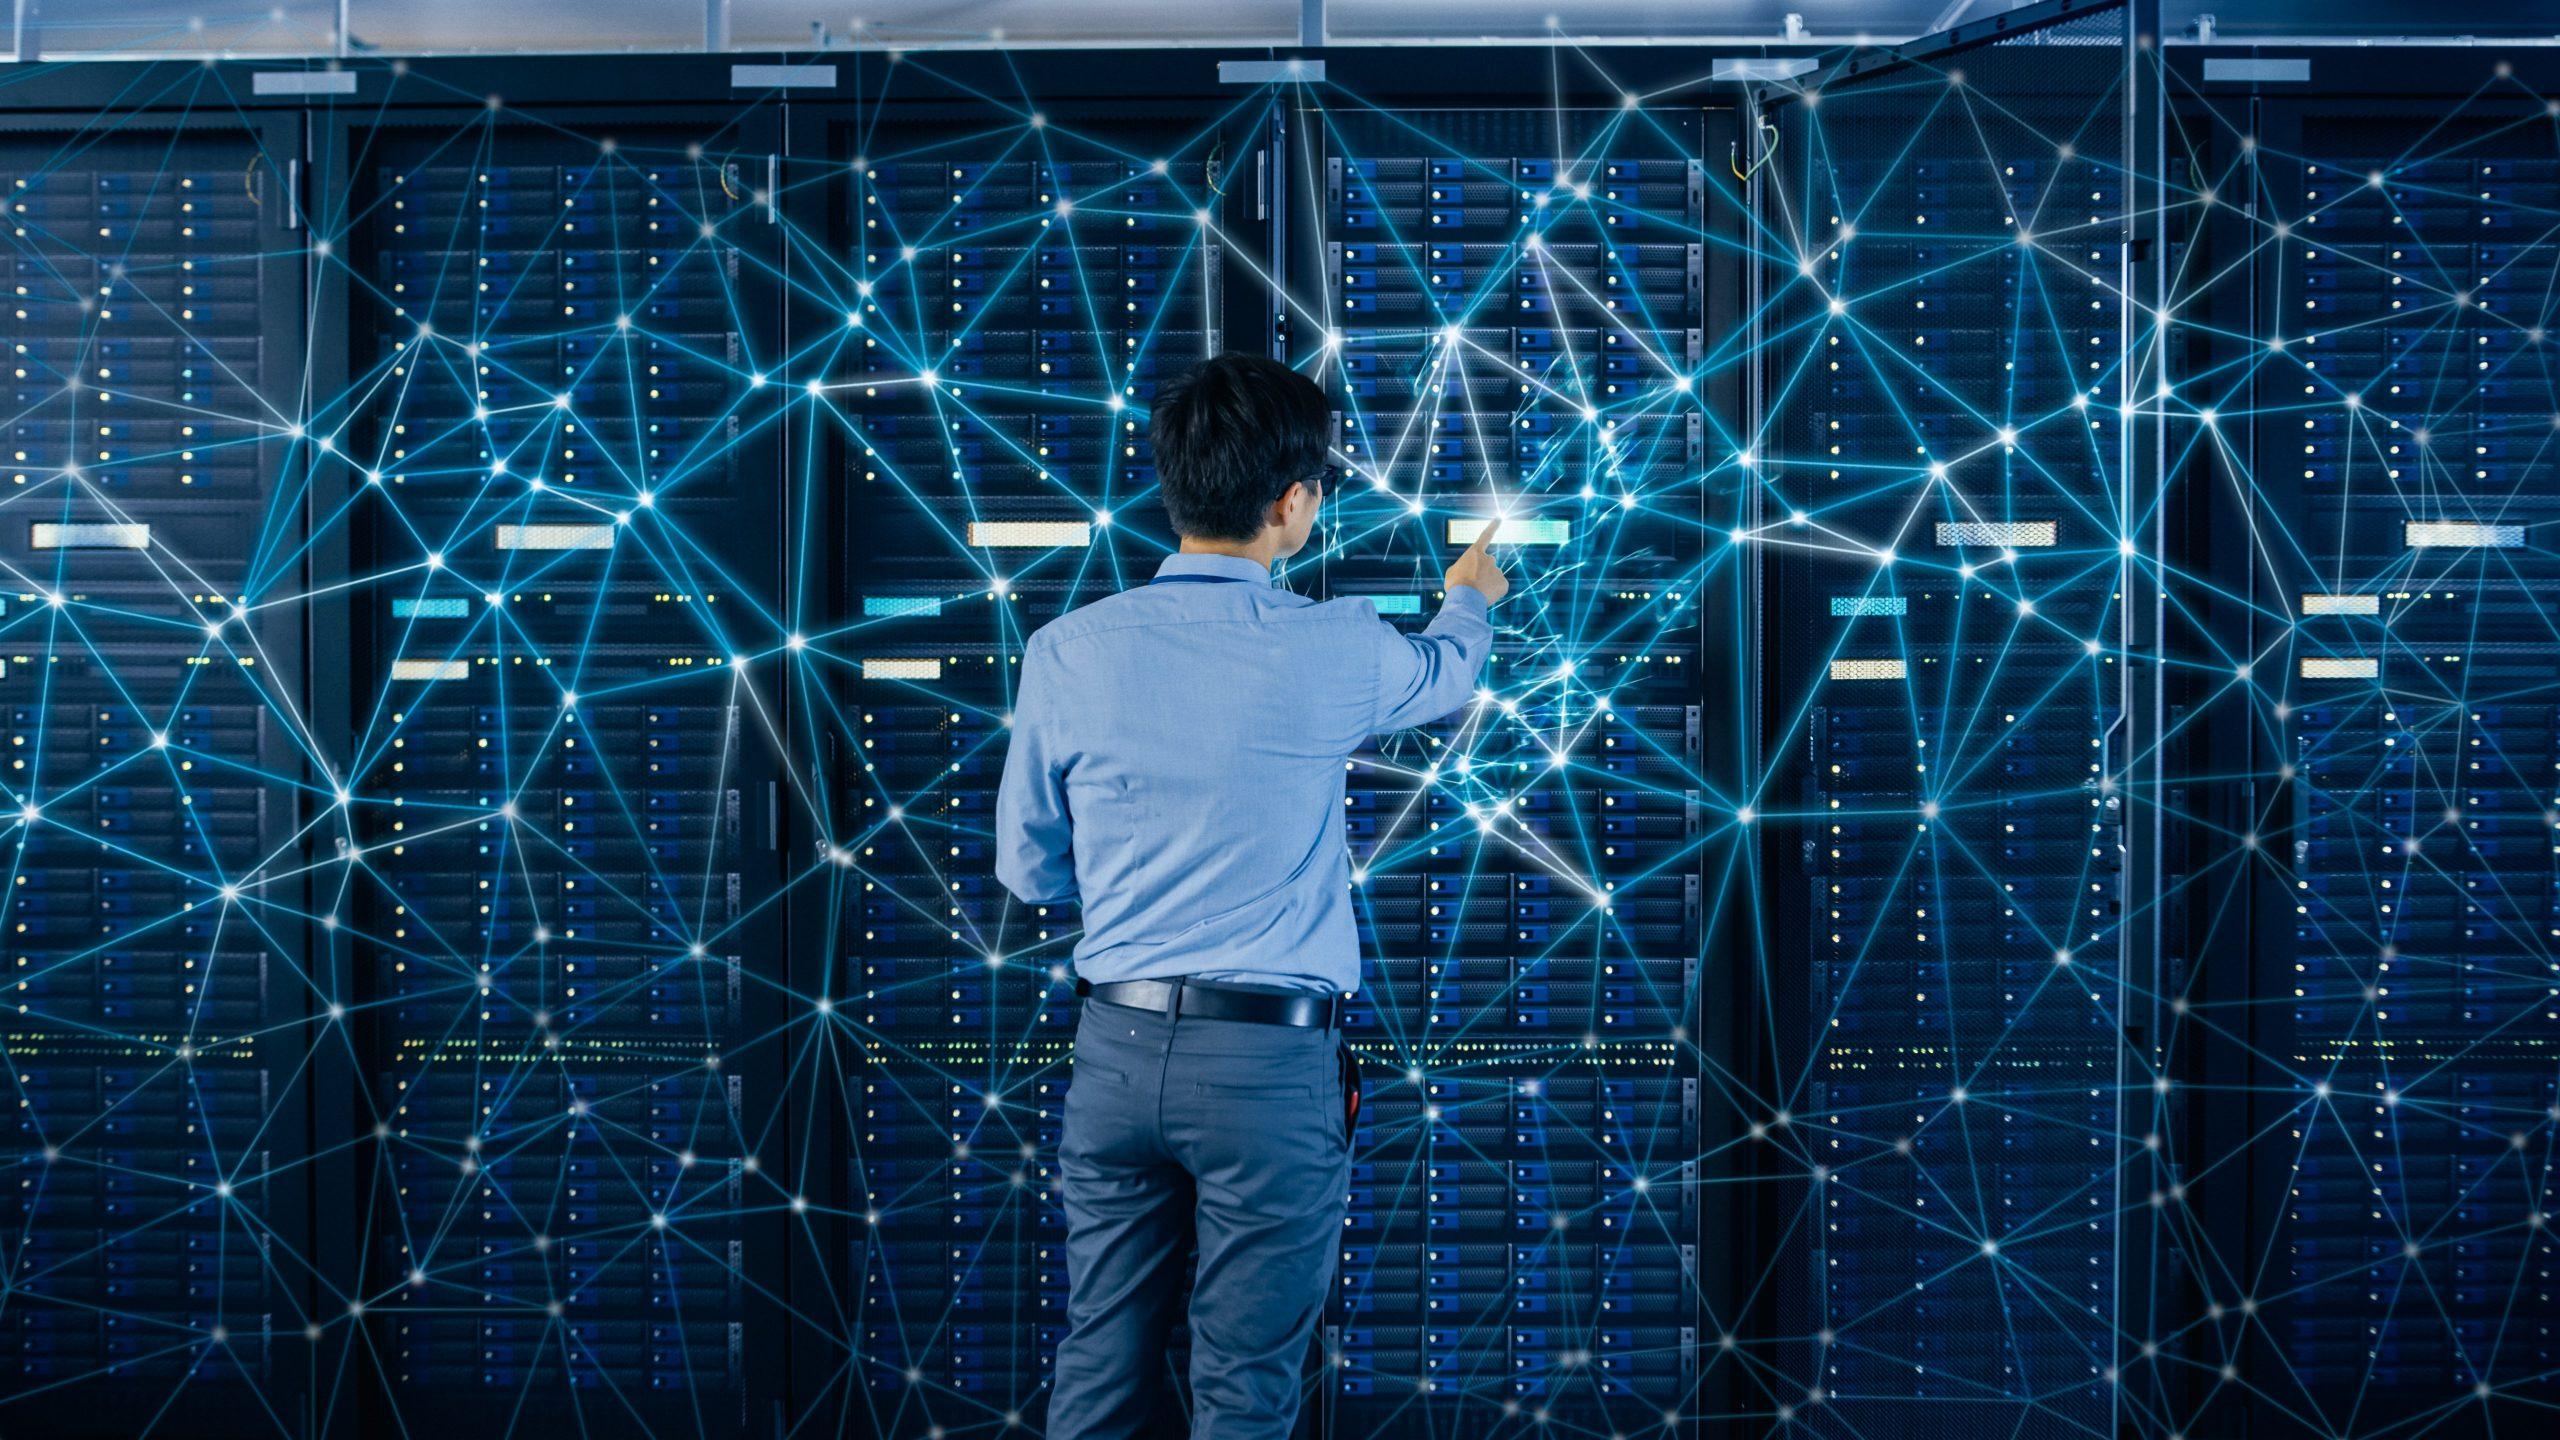 Serverless: The future of cloud computing